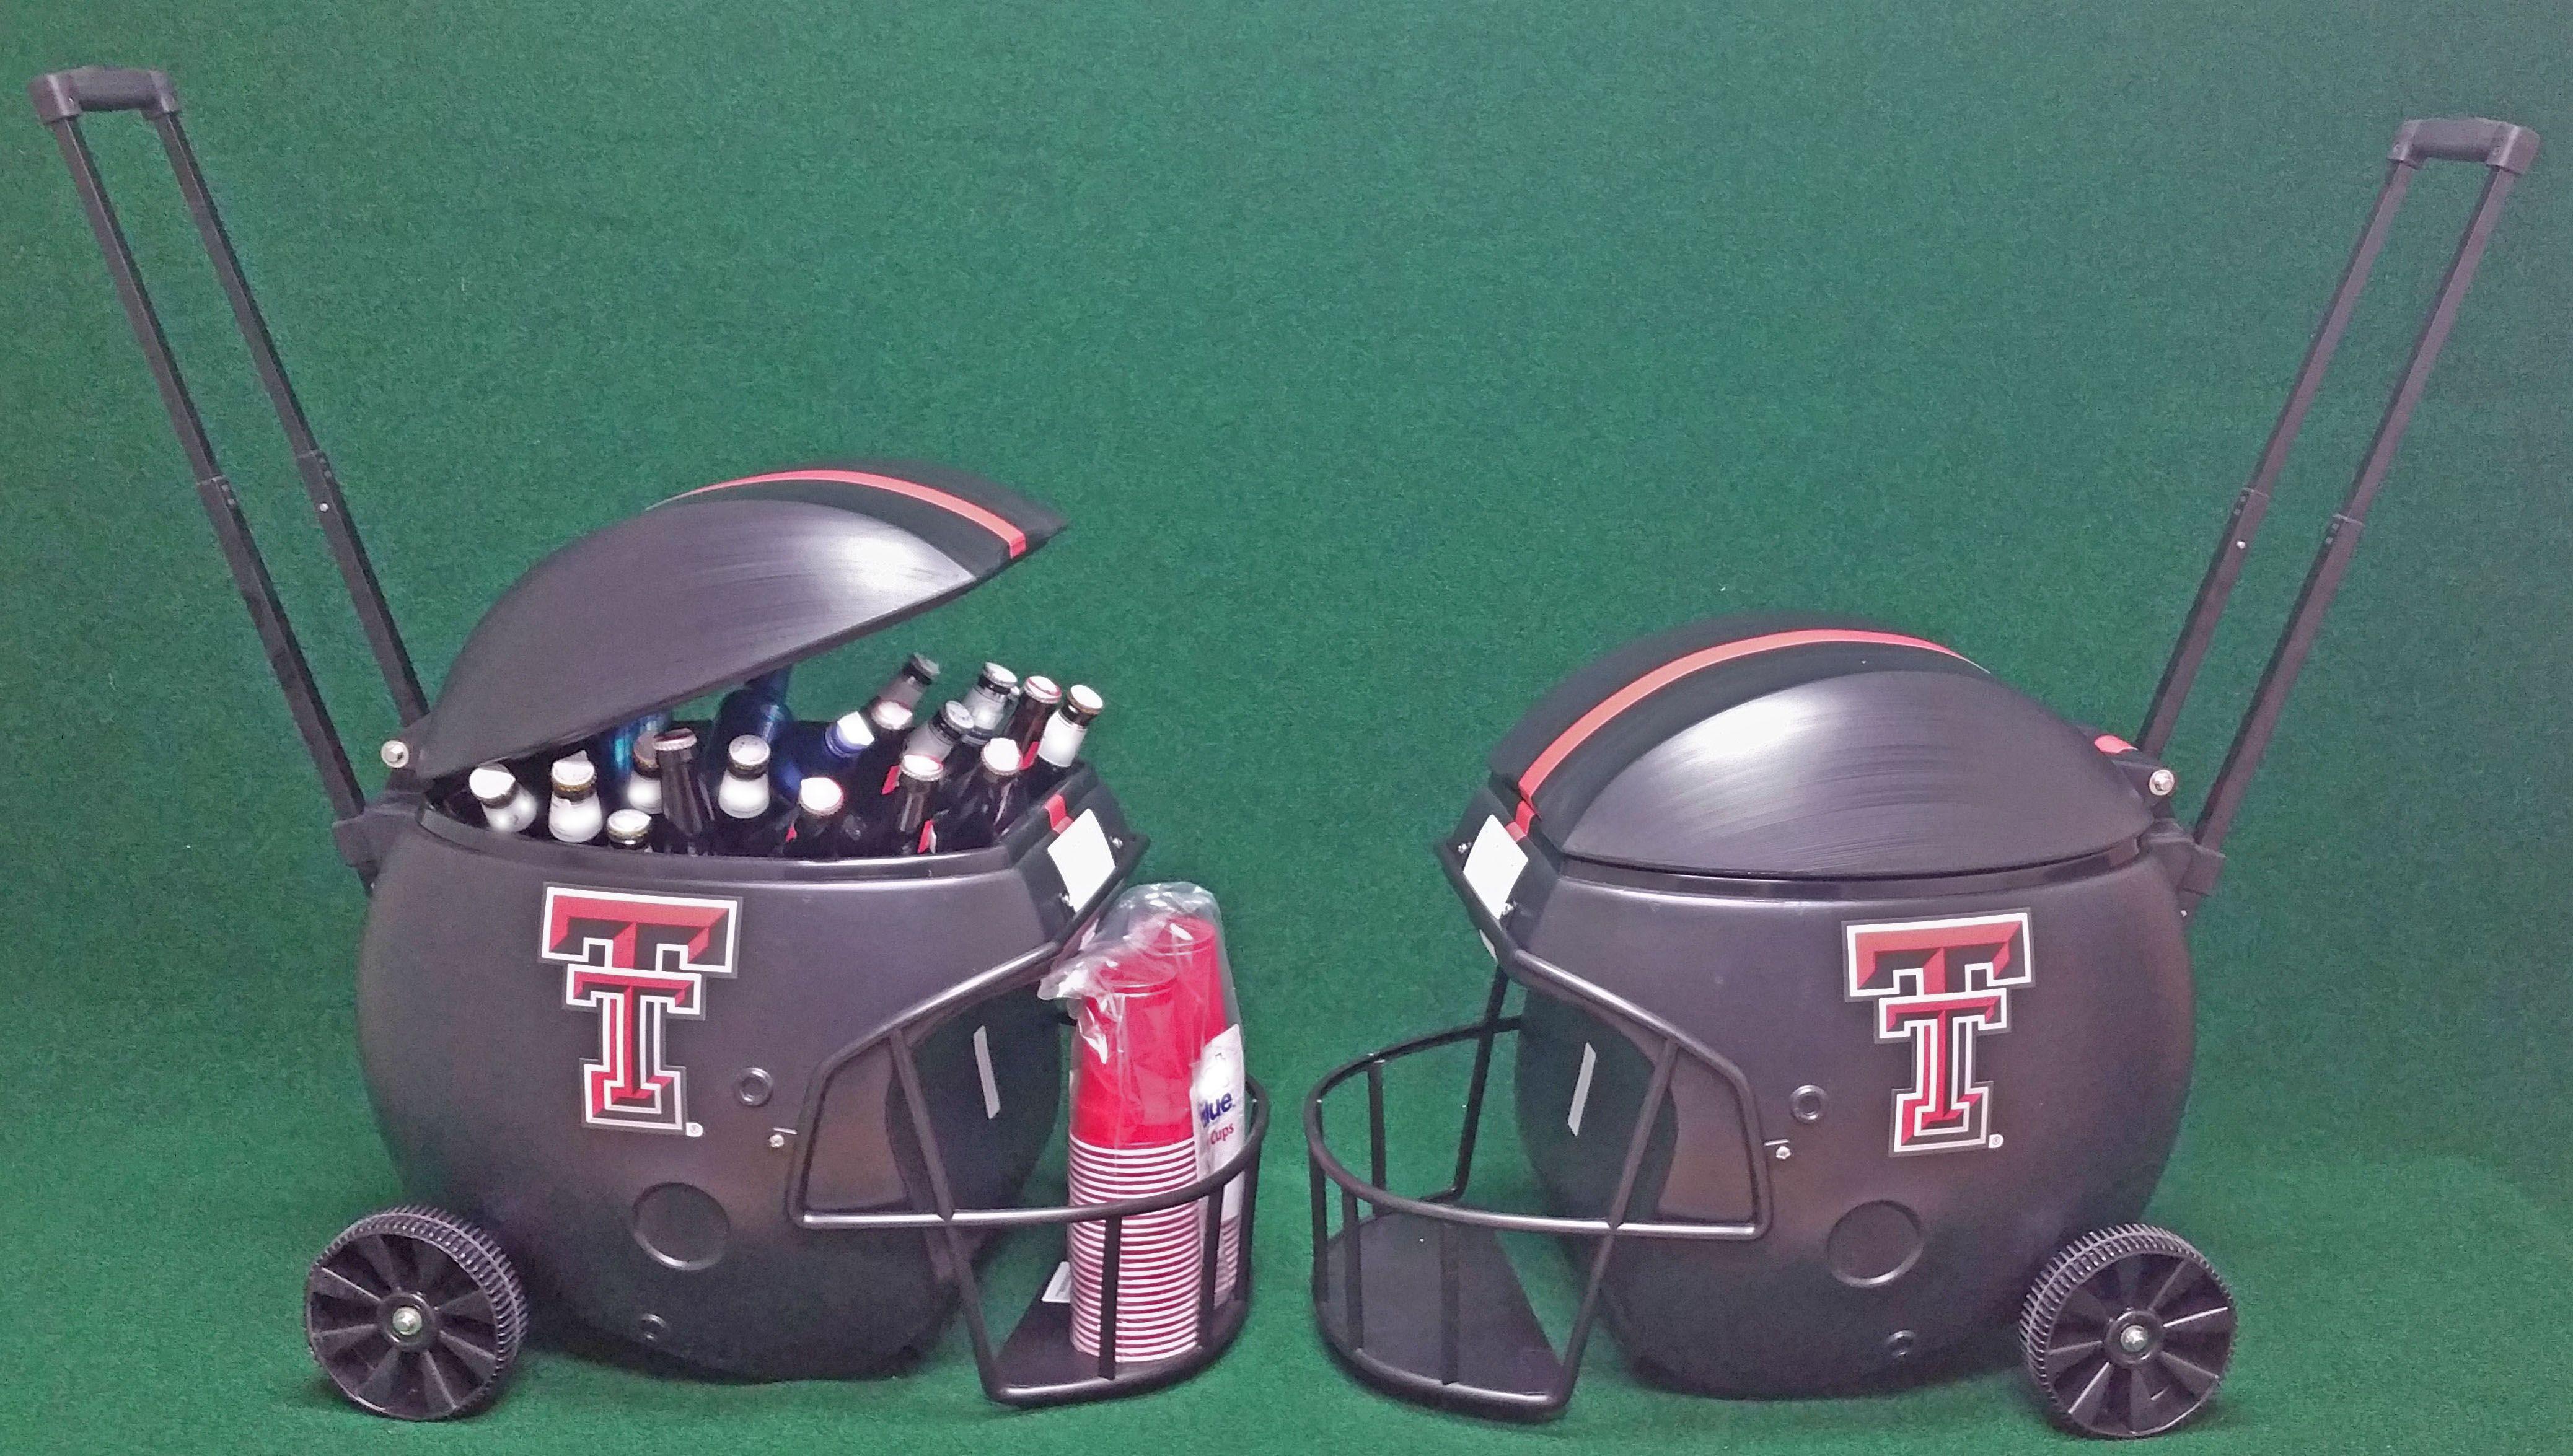 Texas Tech Red Raiders, 40 Quart Football Helmet Ice Chest